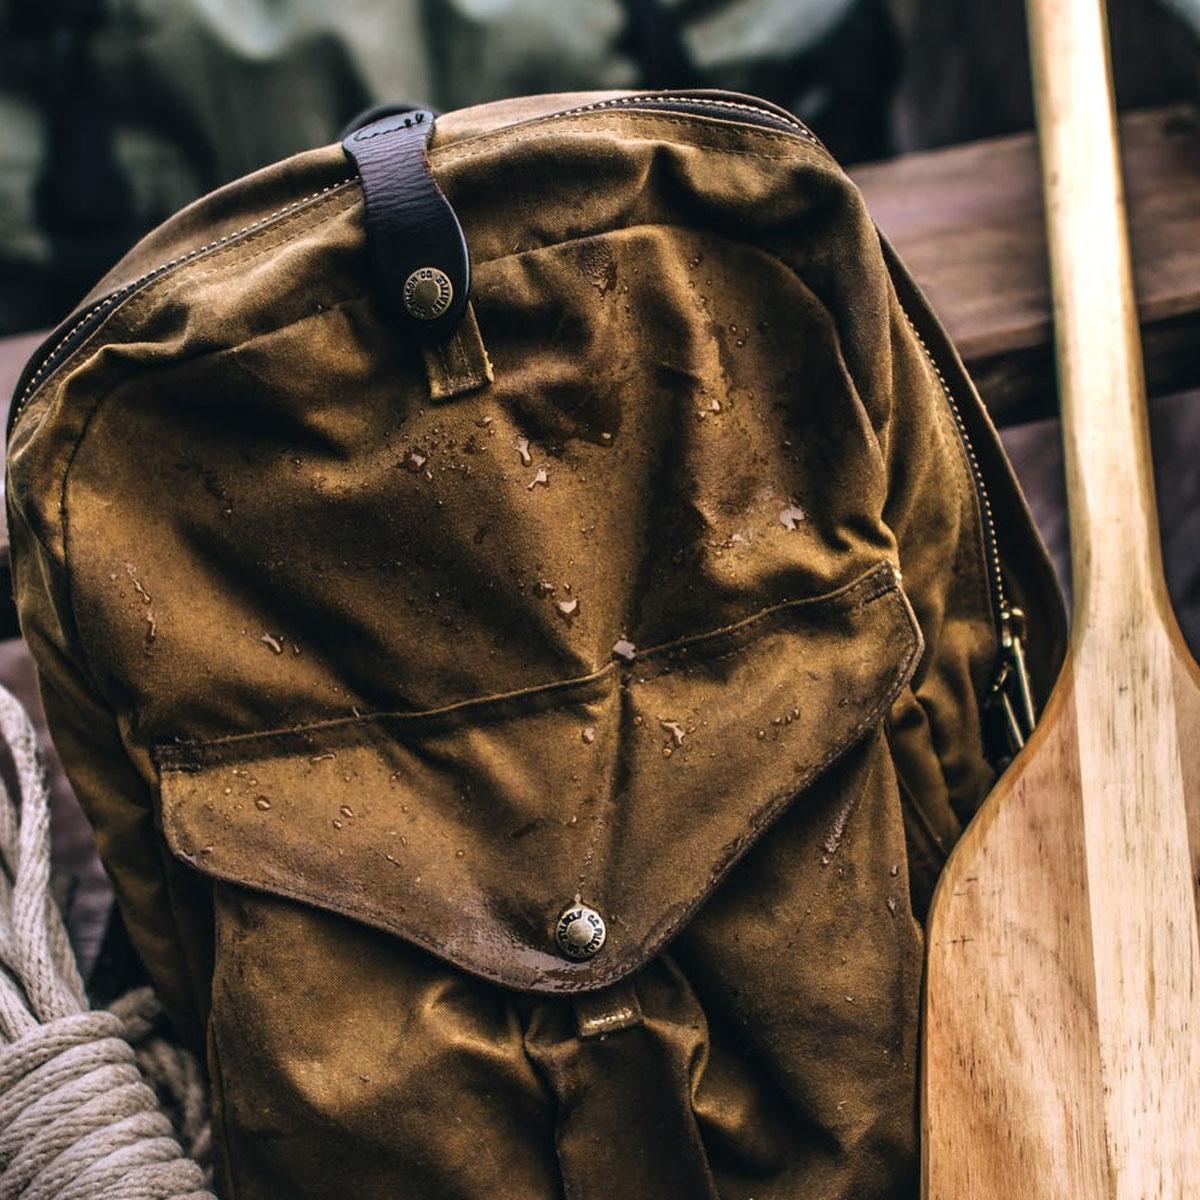 Filson Journeyman Backpack 11070307 Tan, lifestyle